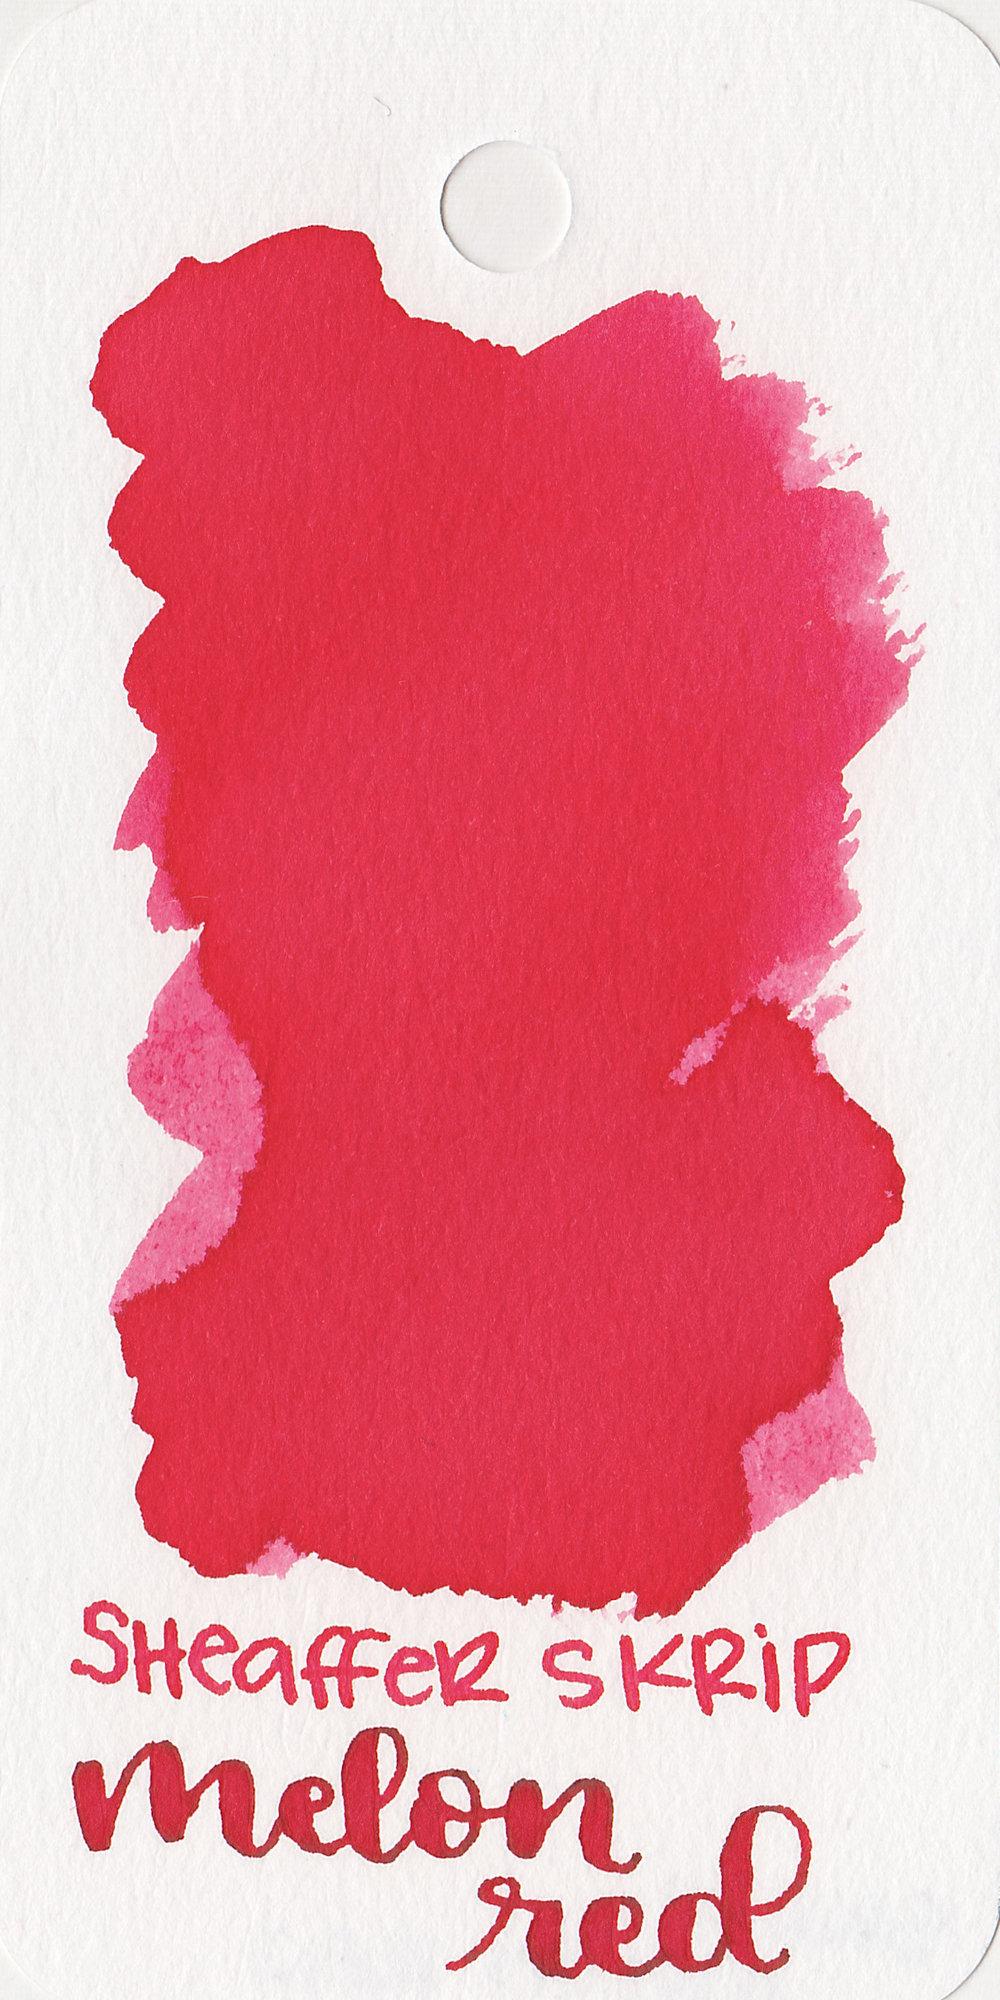 shea-melon-red-1.jpg